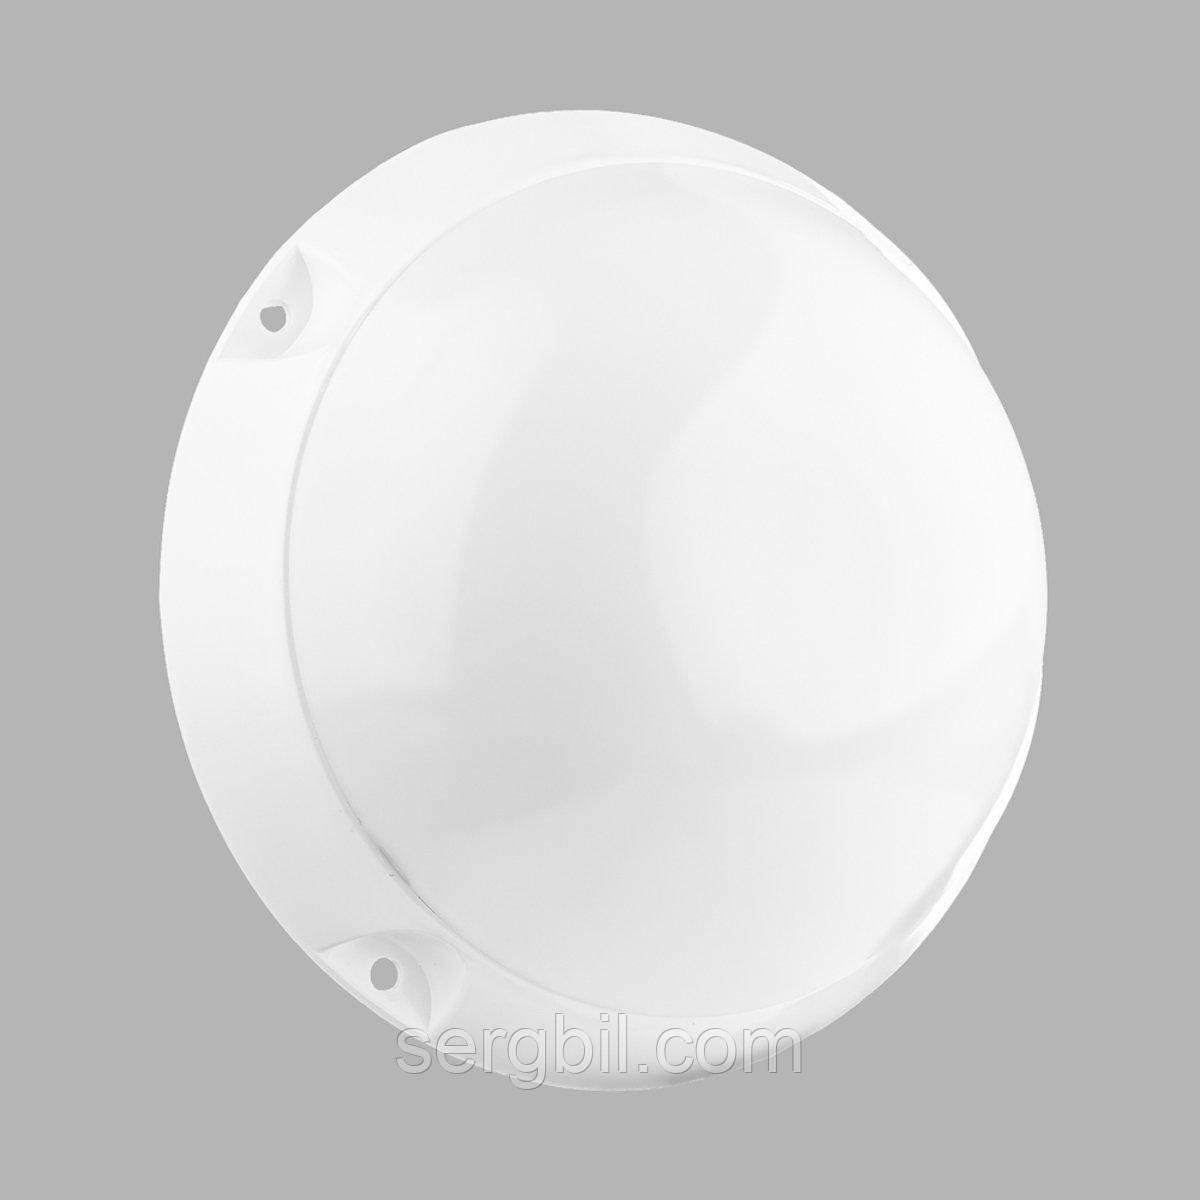 Светильник Profitec LED 12W 1200Lm 4500K IP20